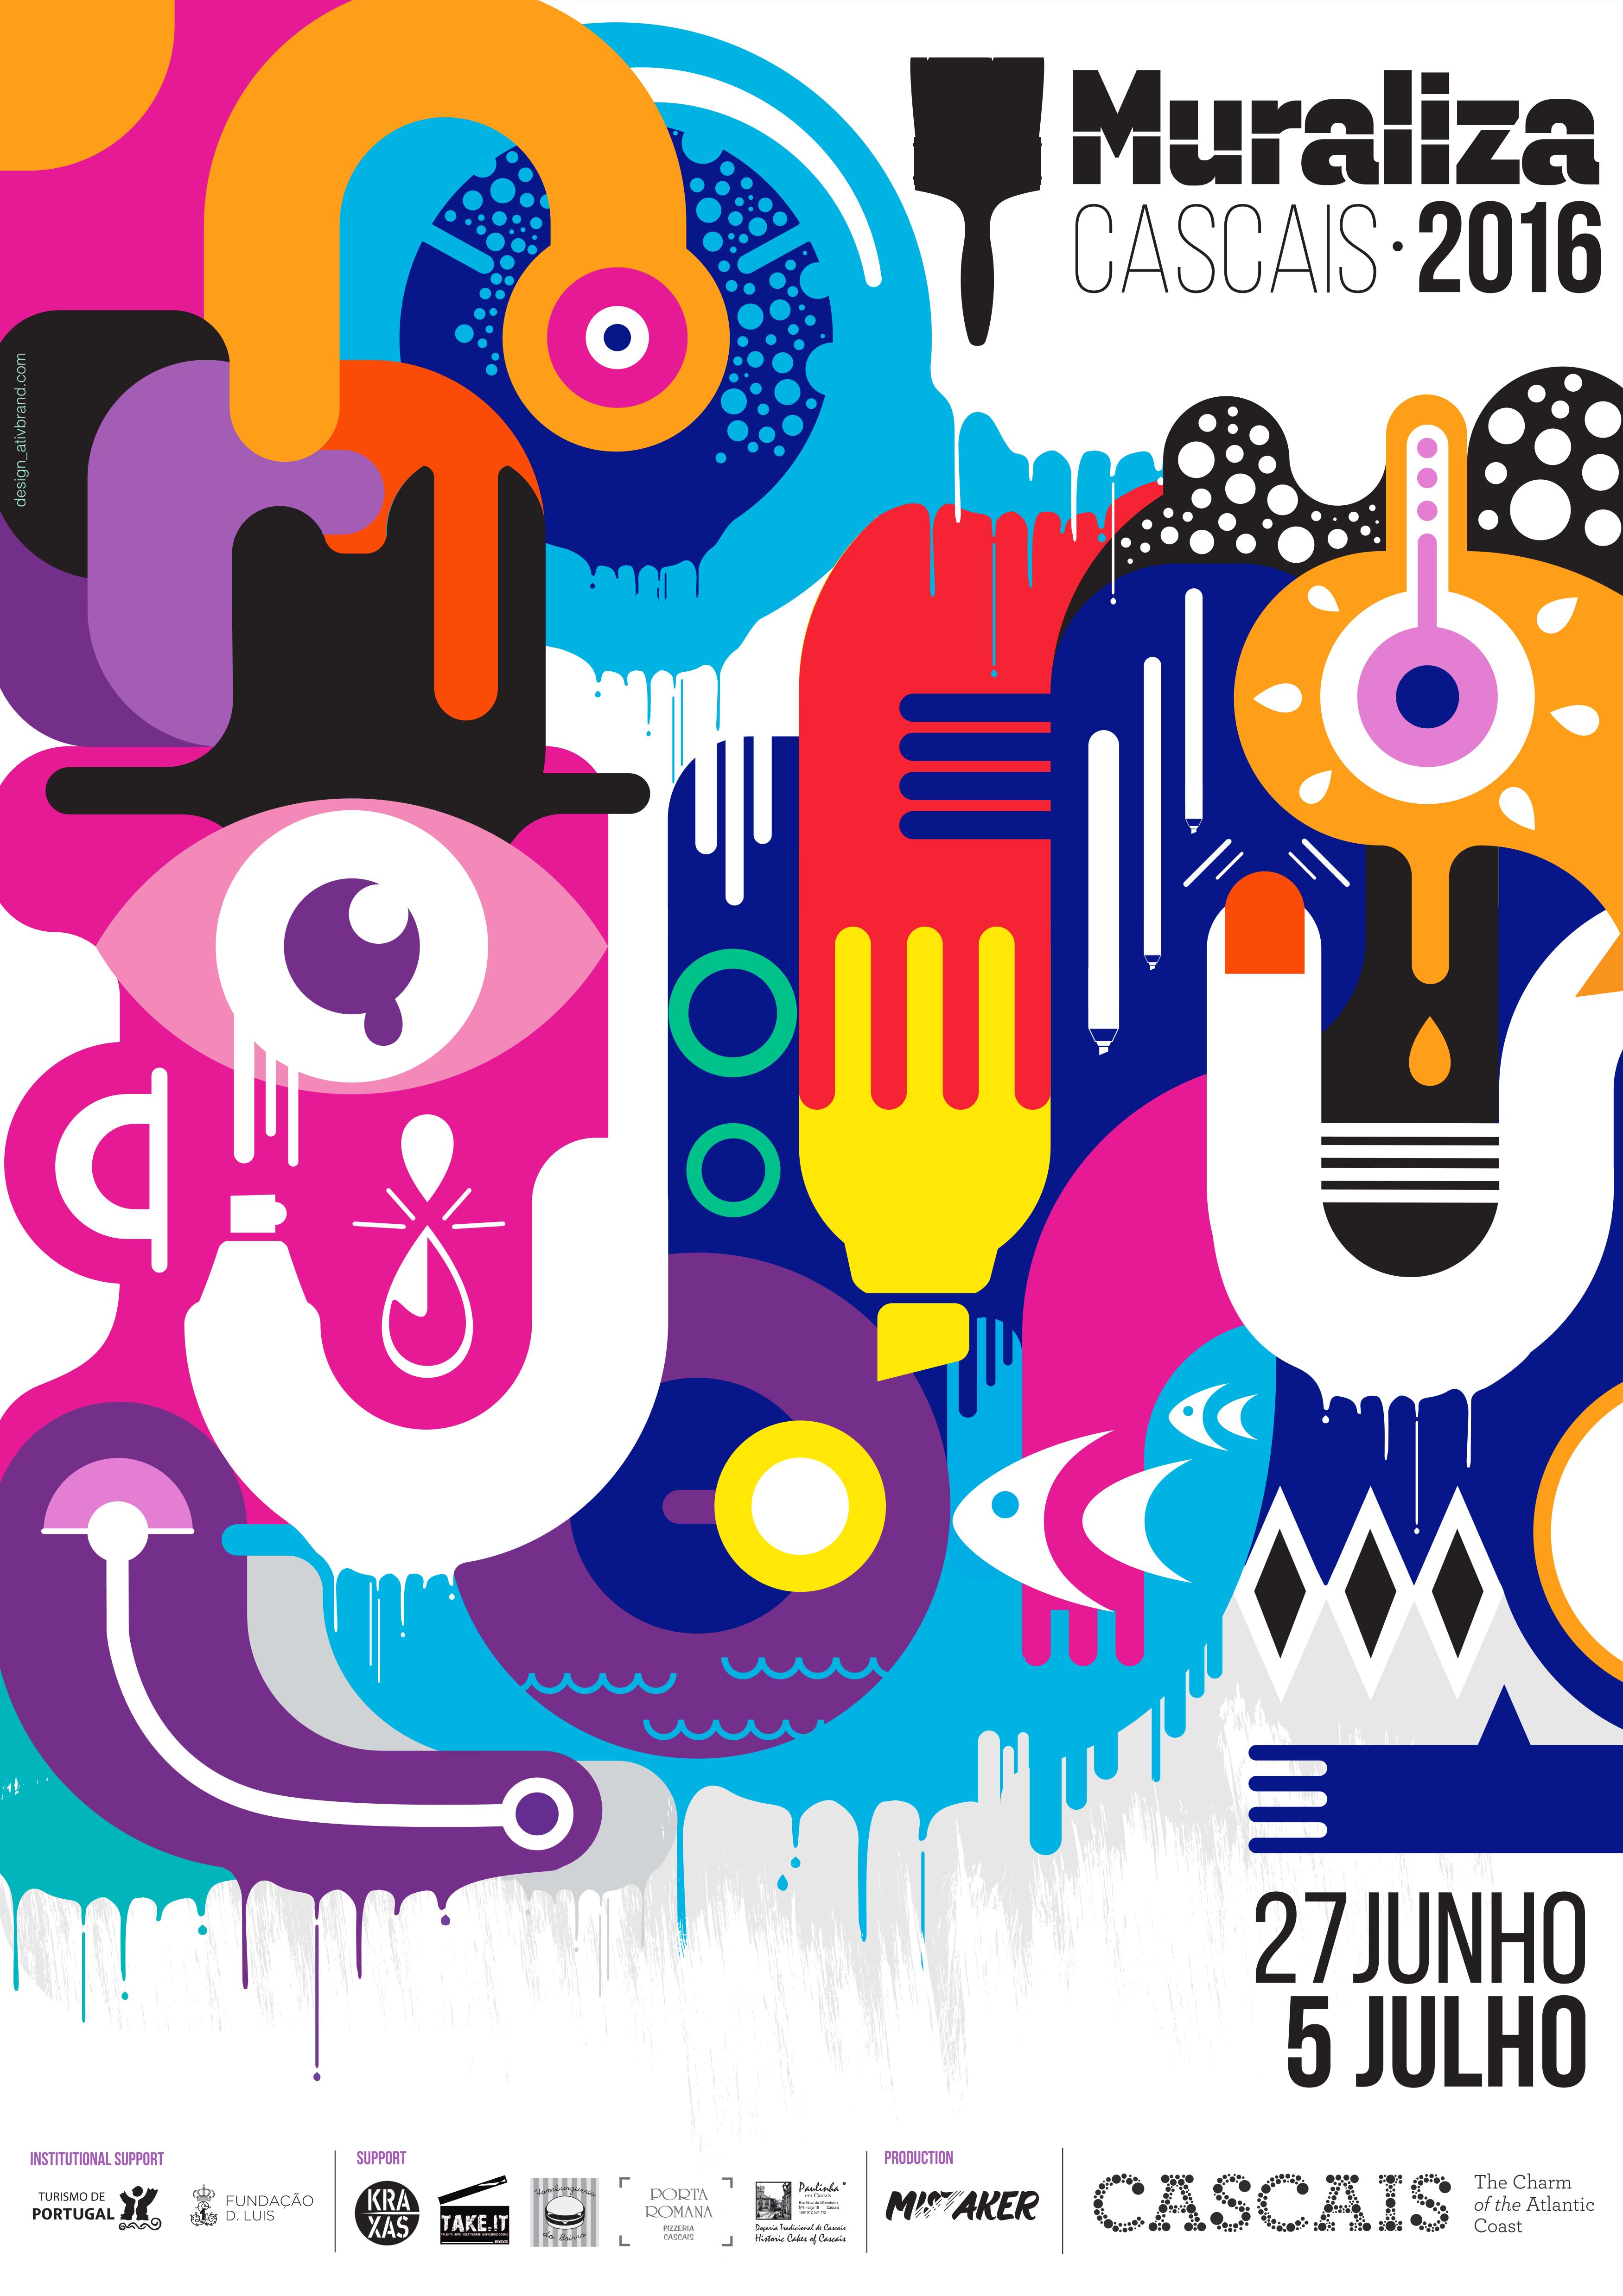 MURALIZA 2016 - 02 _ cartaz